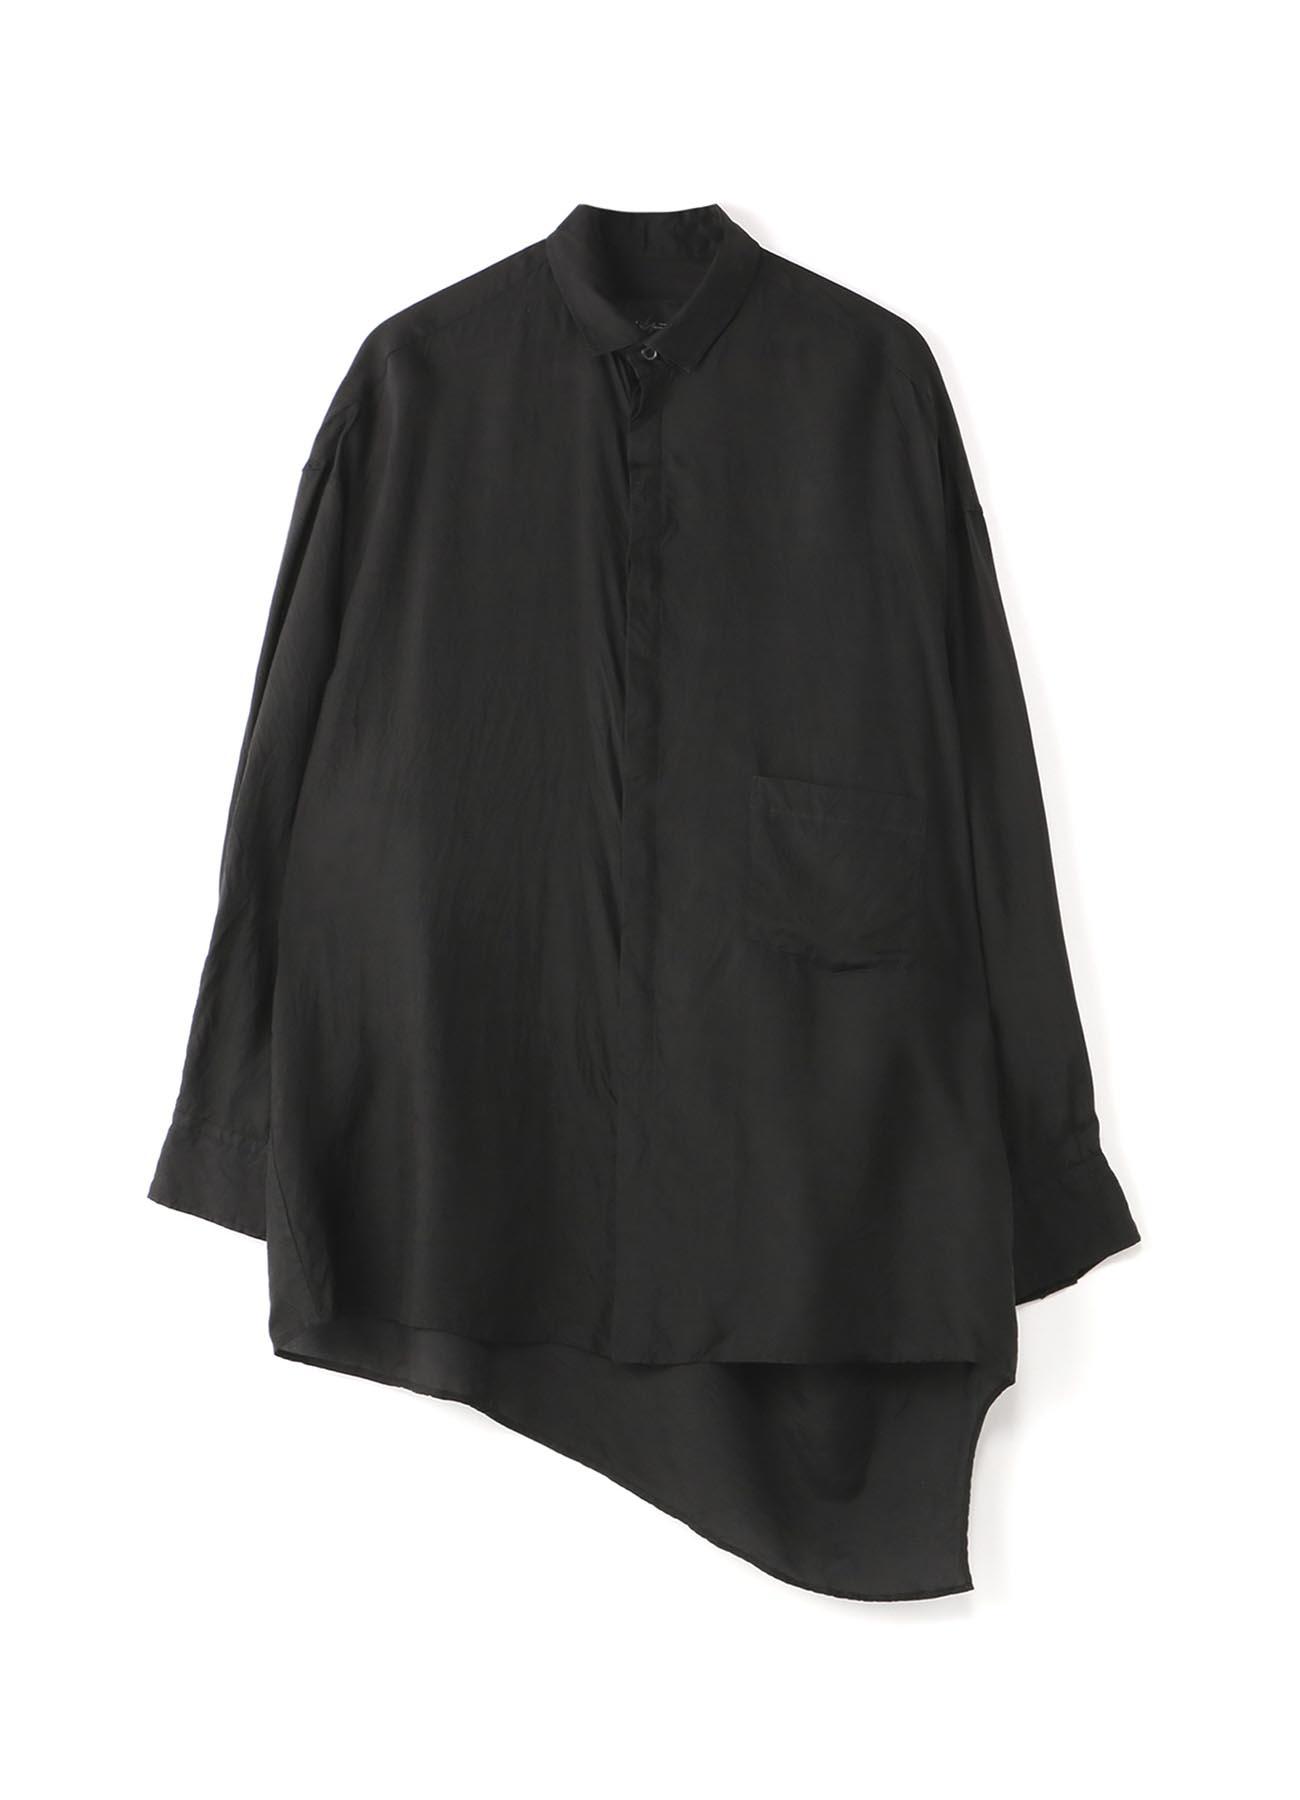 Cupla Taffeta背面Tawami衬衫